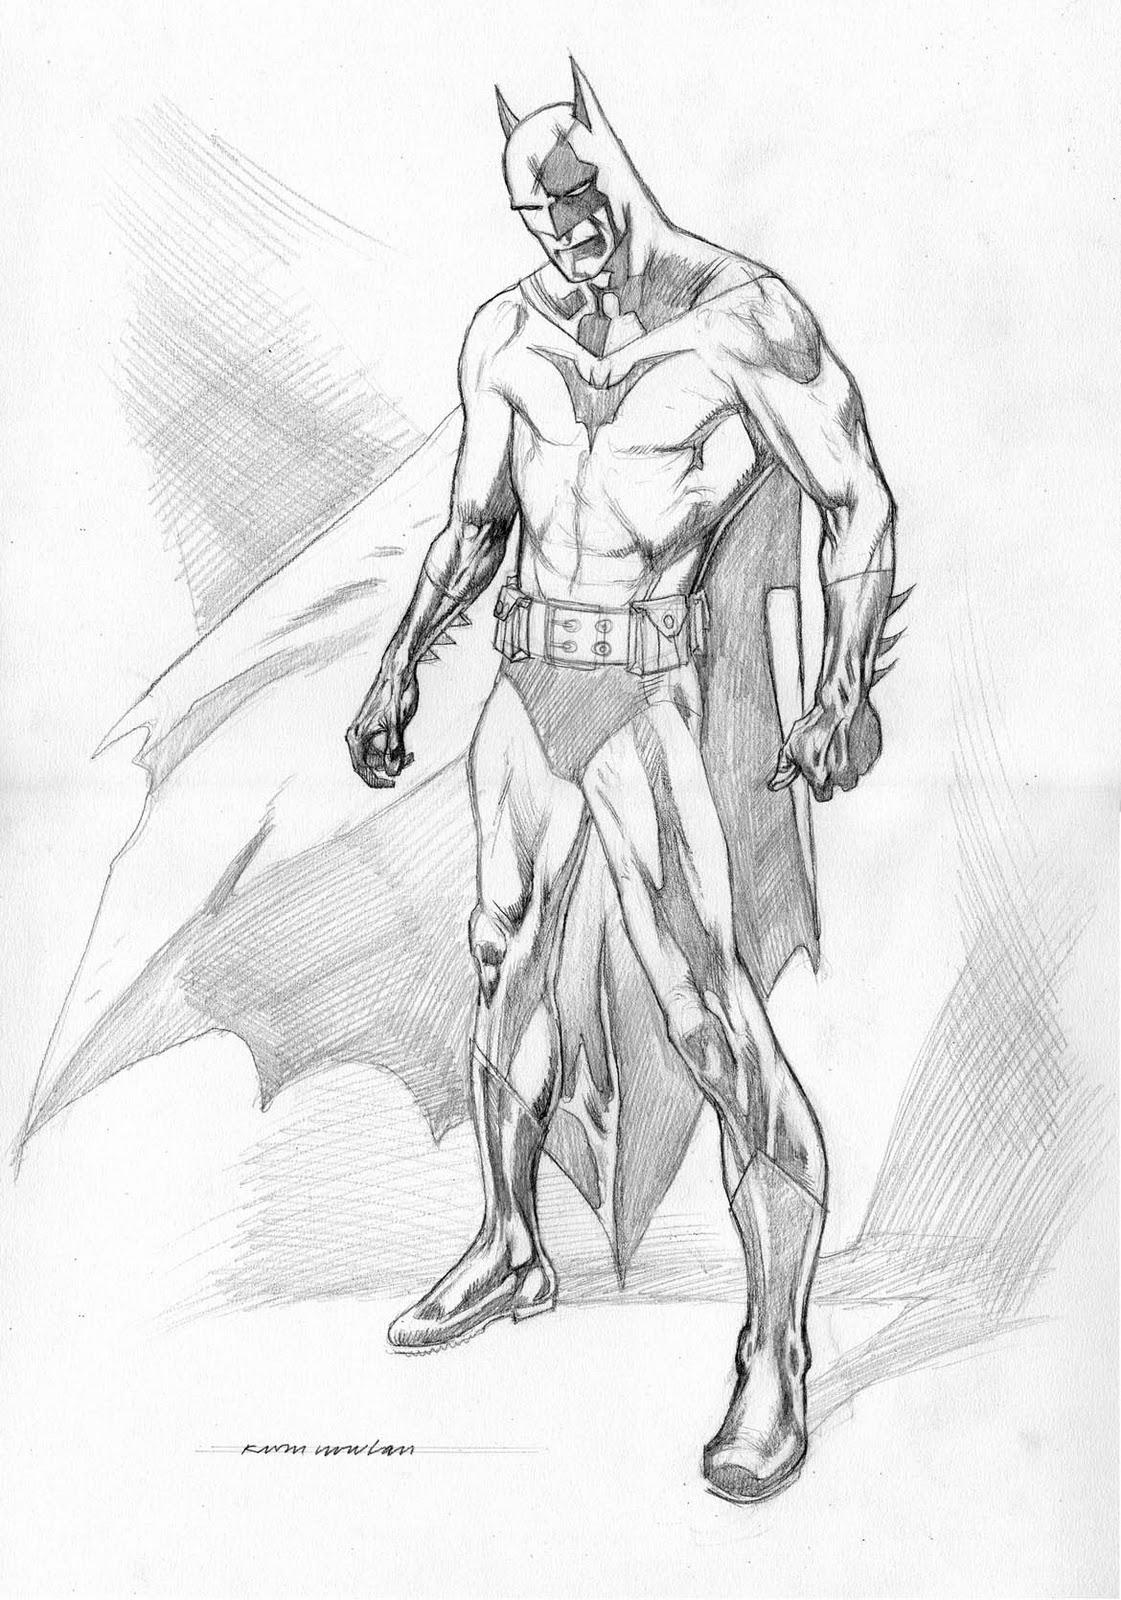 Kevin Nowlan: Batman pencil drawing Batman Drawing In Pencil Easy